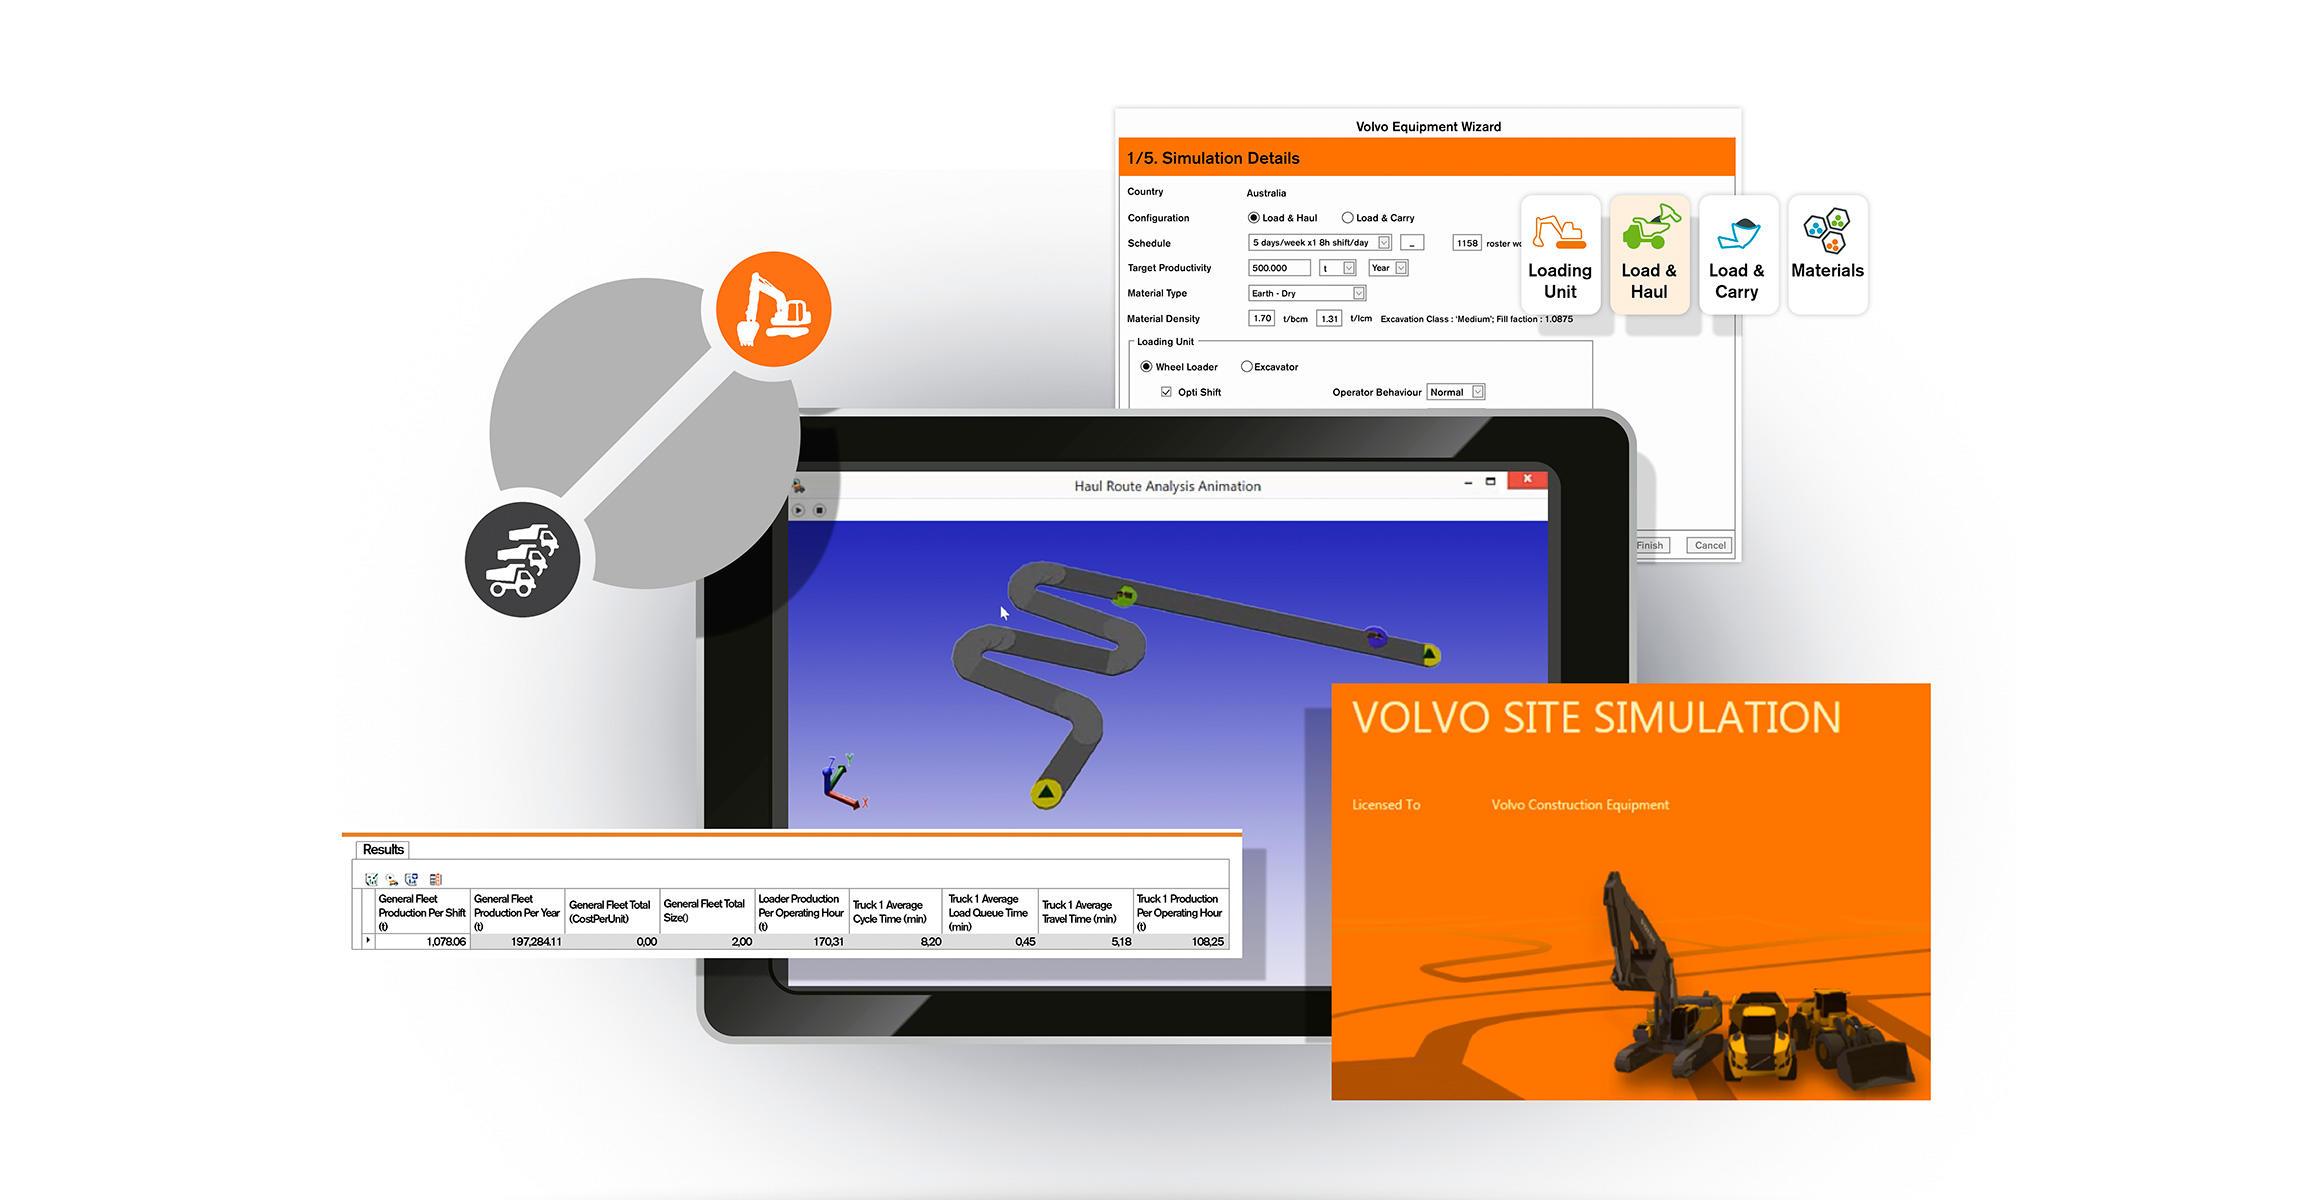 Volvo Site Simulation Software